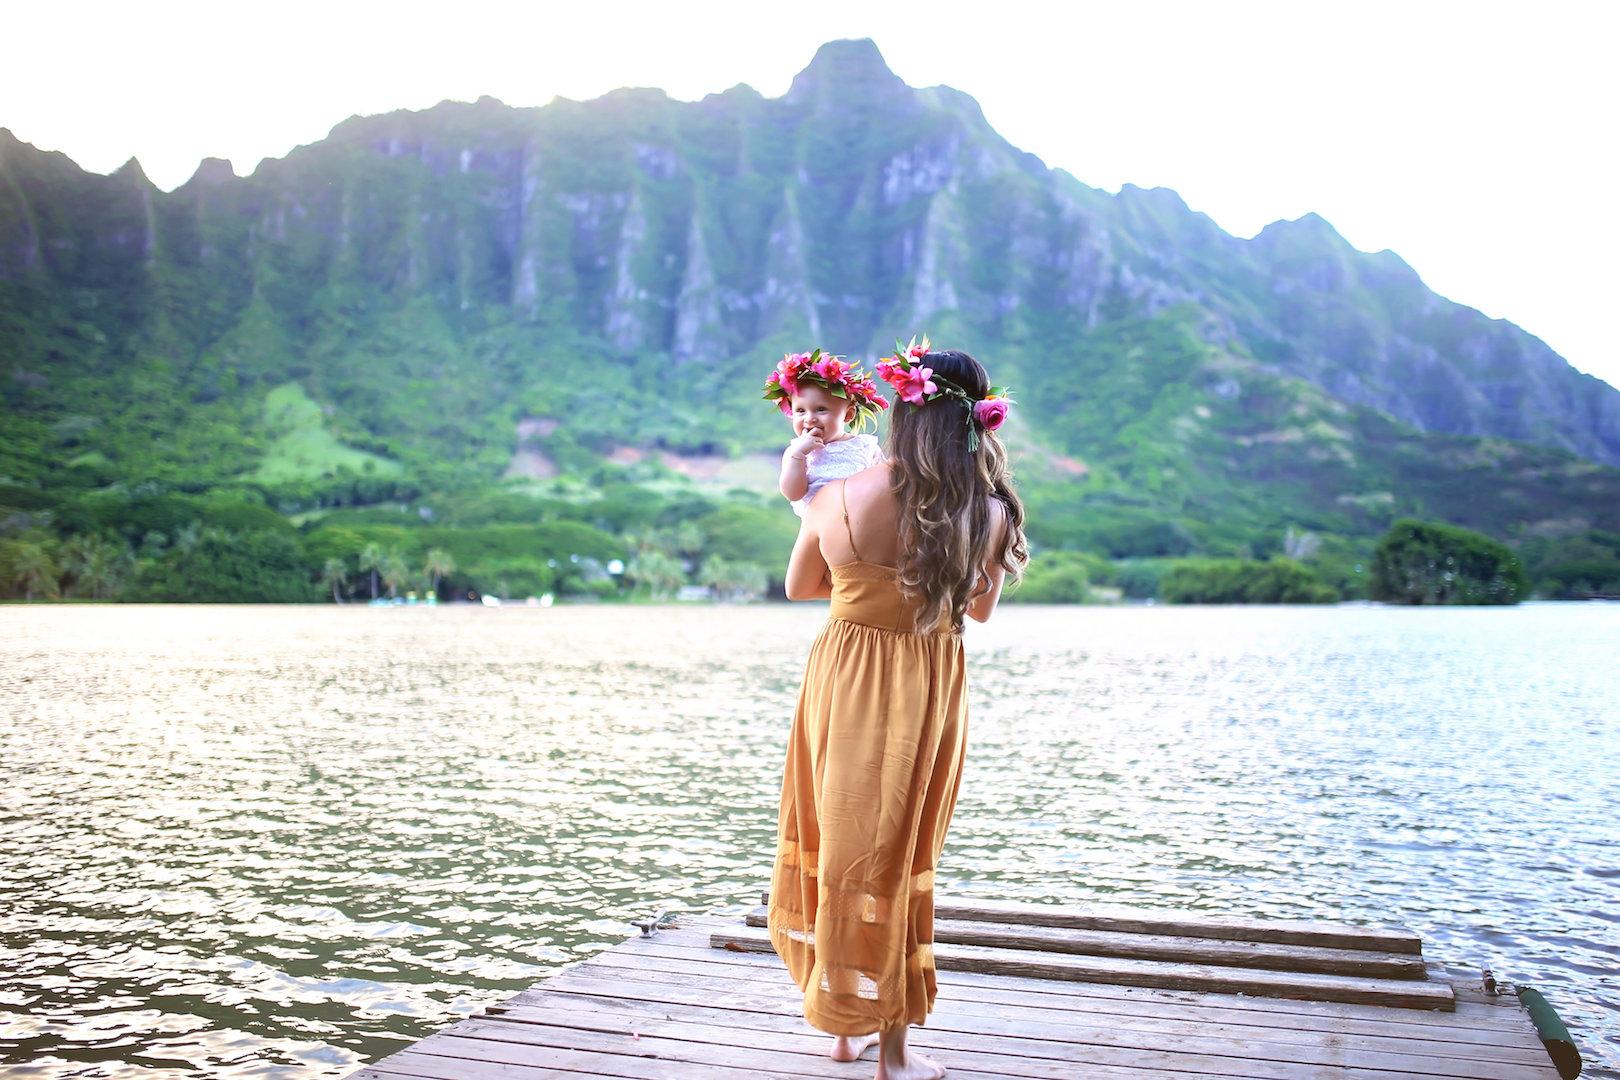 Aloha Paralegal Services - Hawaii Divorce Services